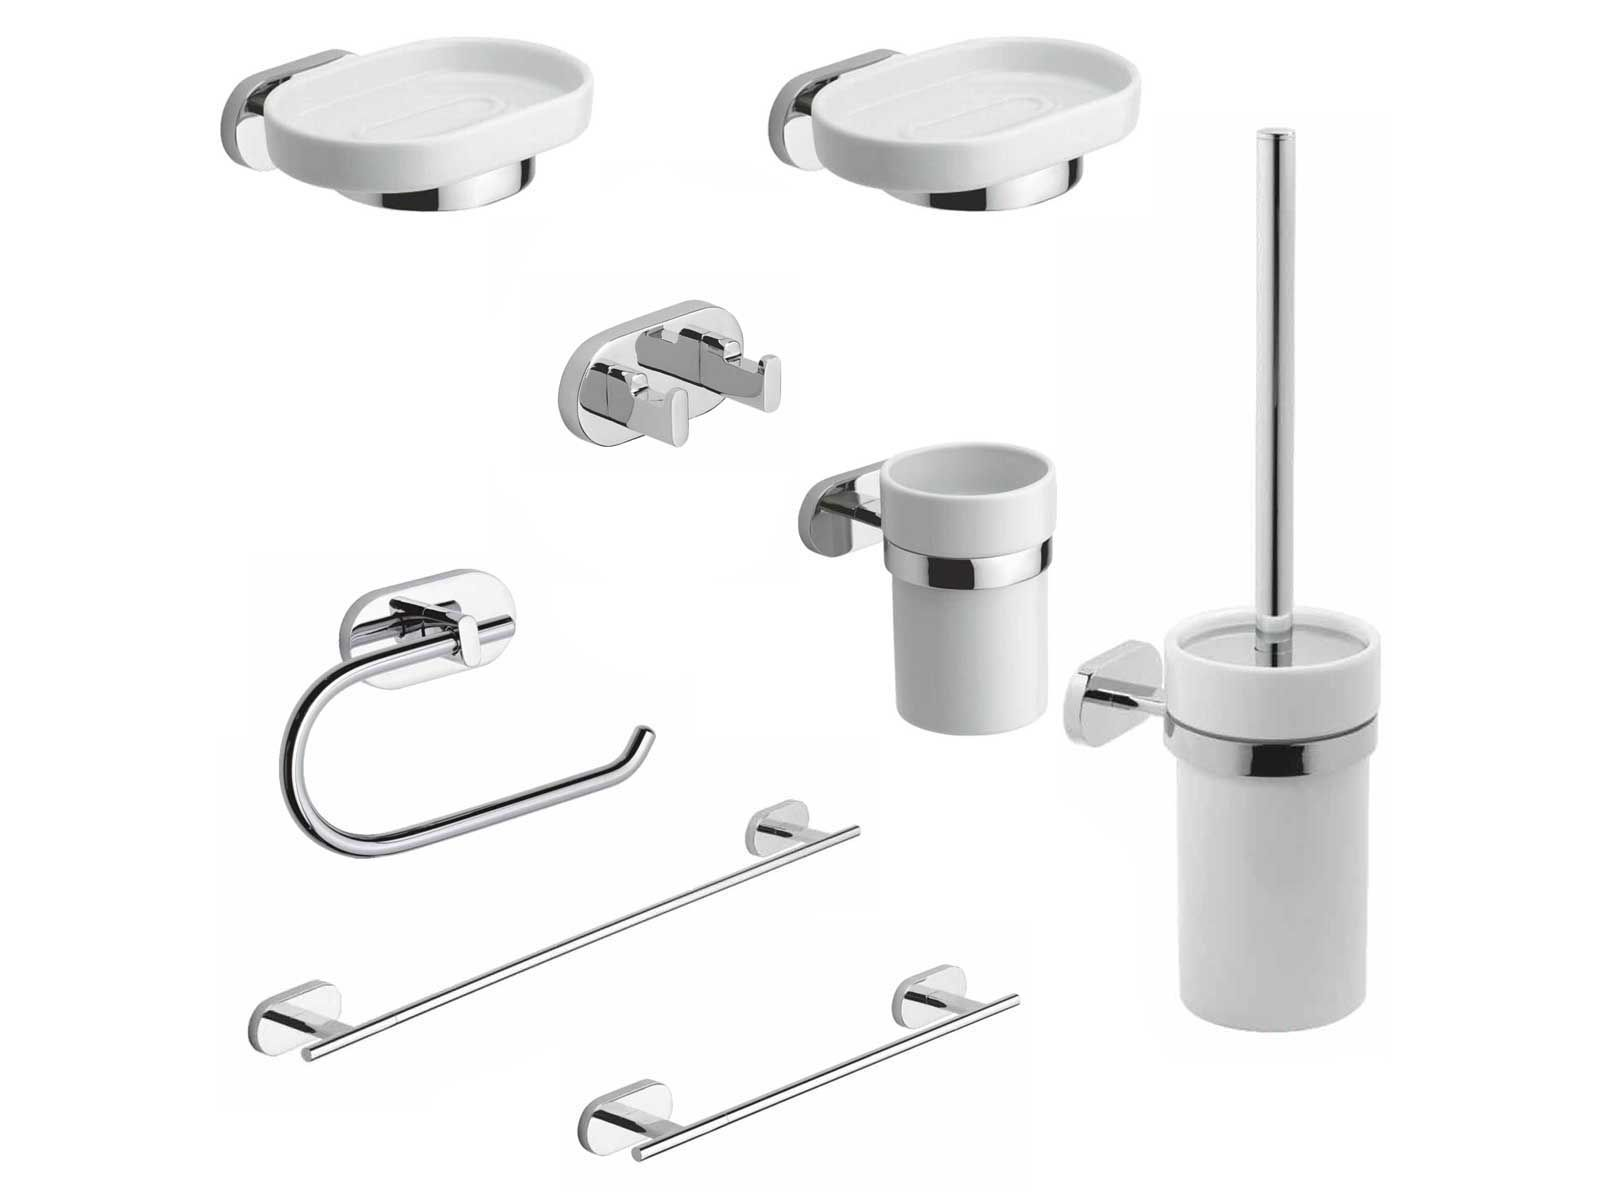 Kit accessori bagno louise 8 pezzi metaform - Pezzi per bagno ...